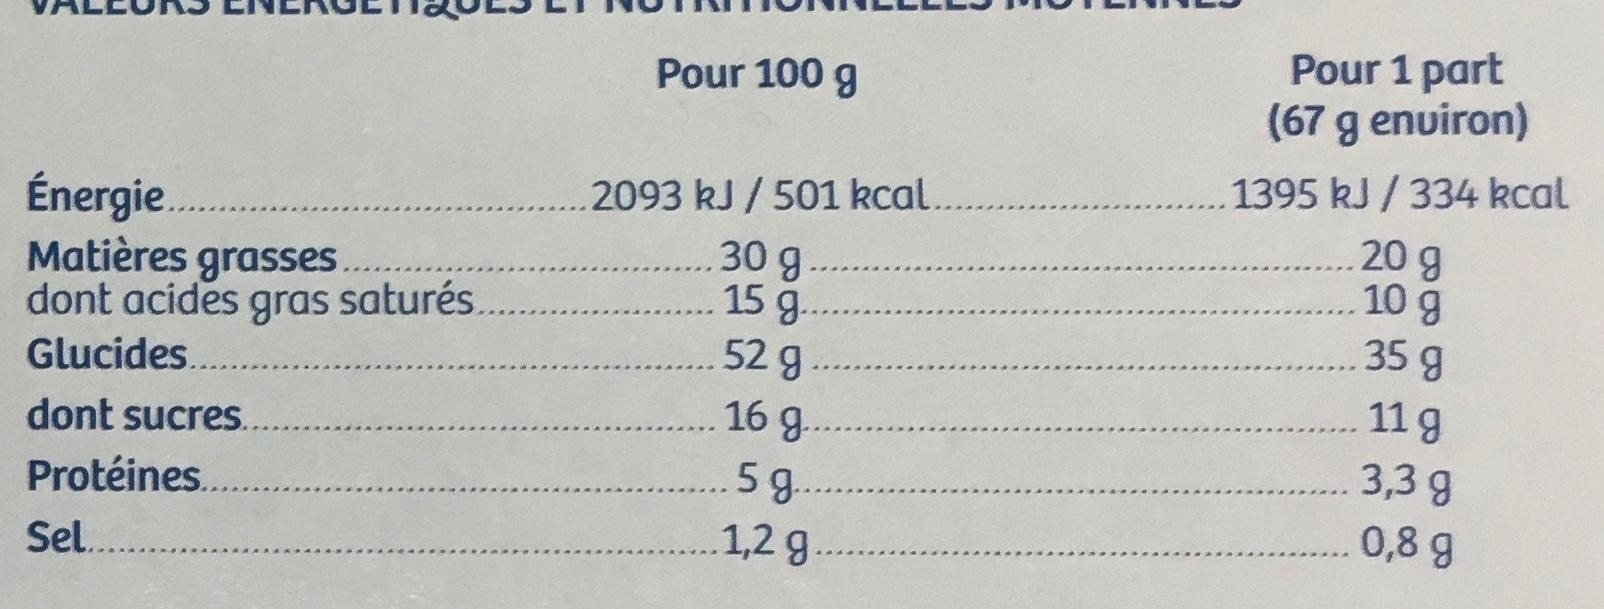 Galette des Rois 40% Frangipane - Nutrition facts - fr